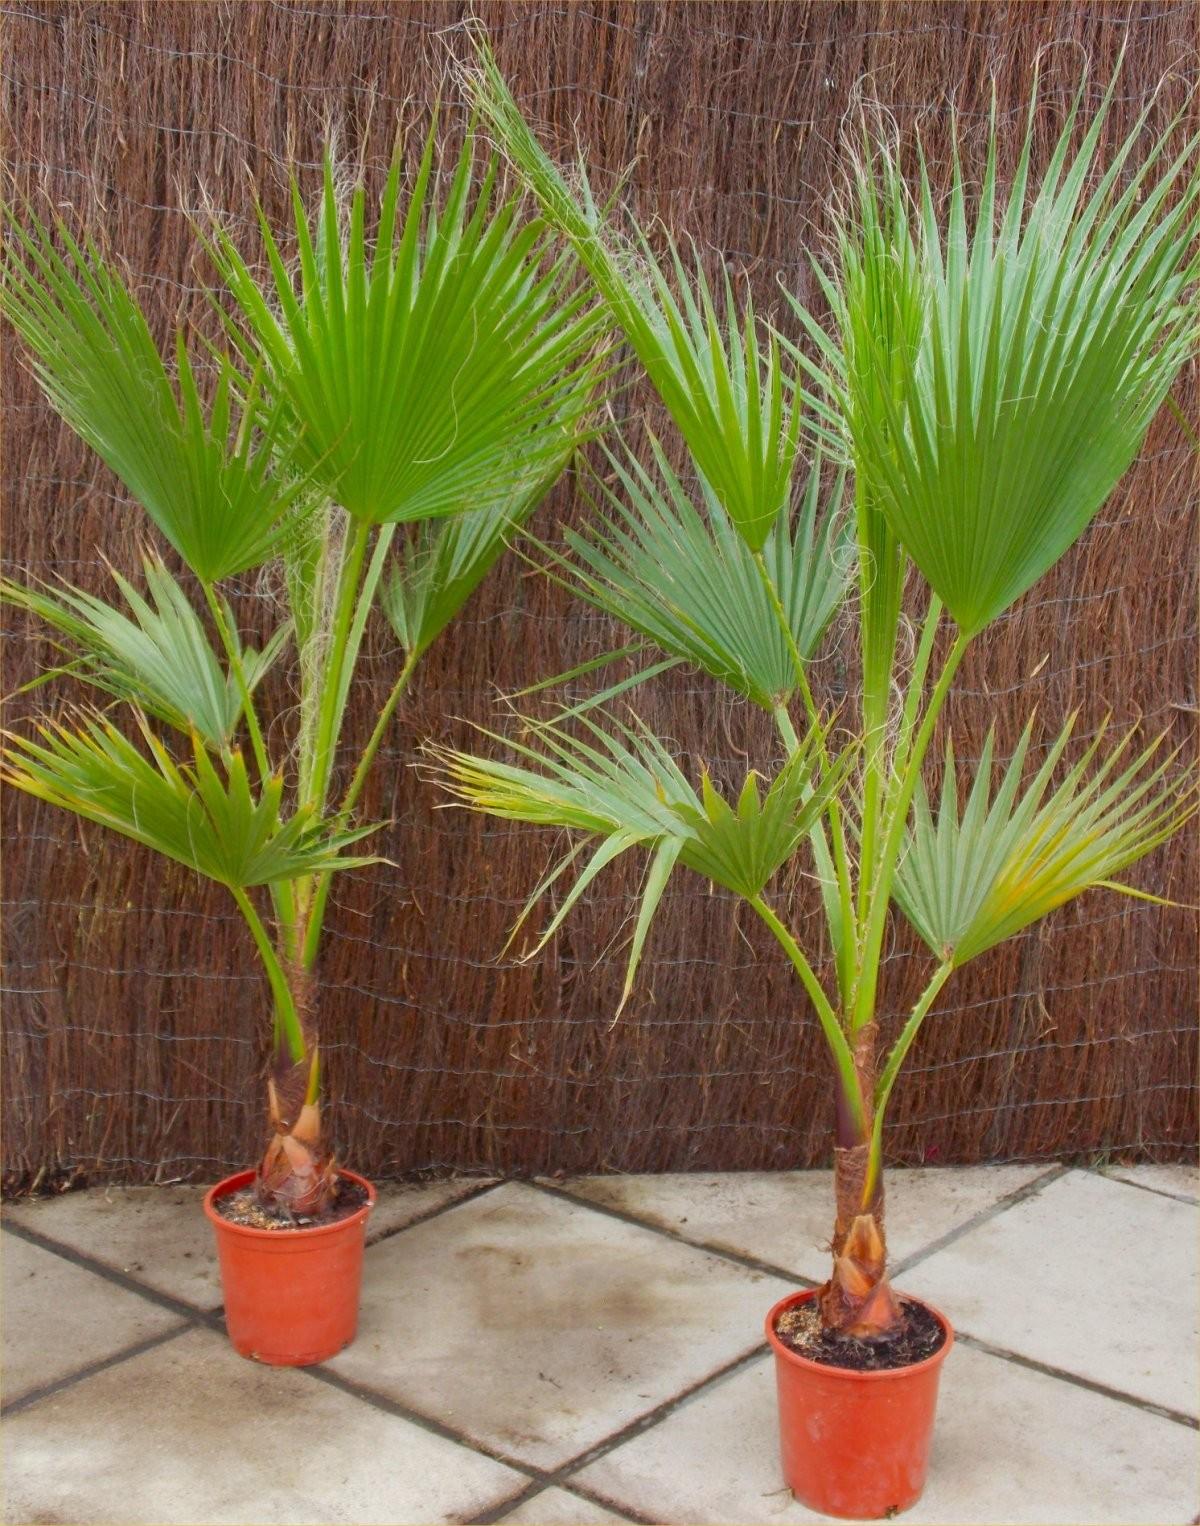 Washingtonia Robusta Palm Tree instore at B&M for £14.99